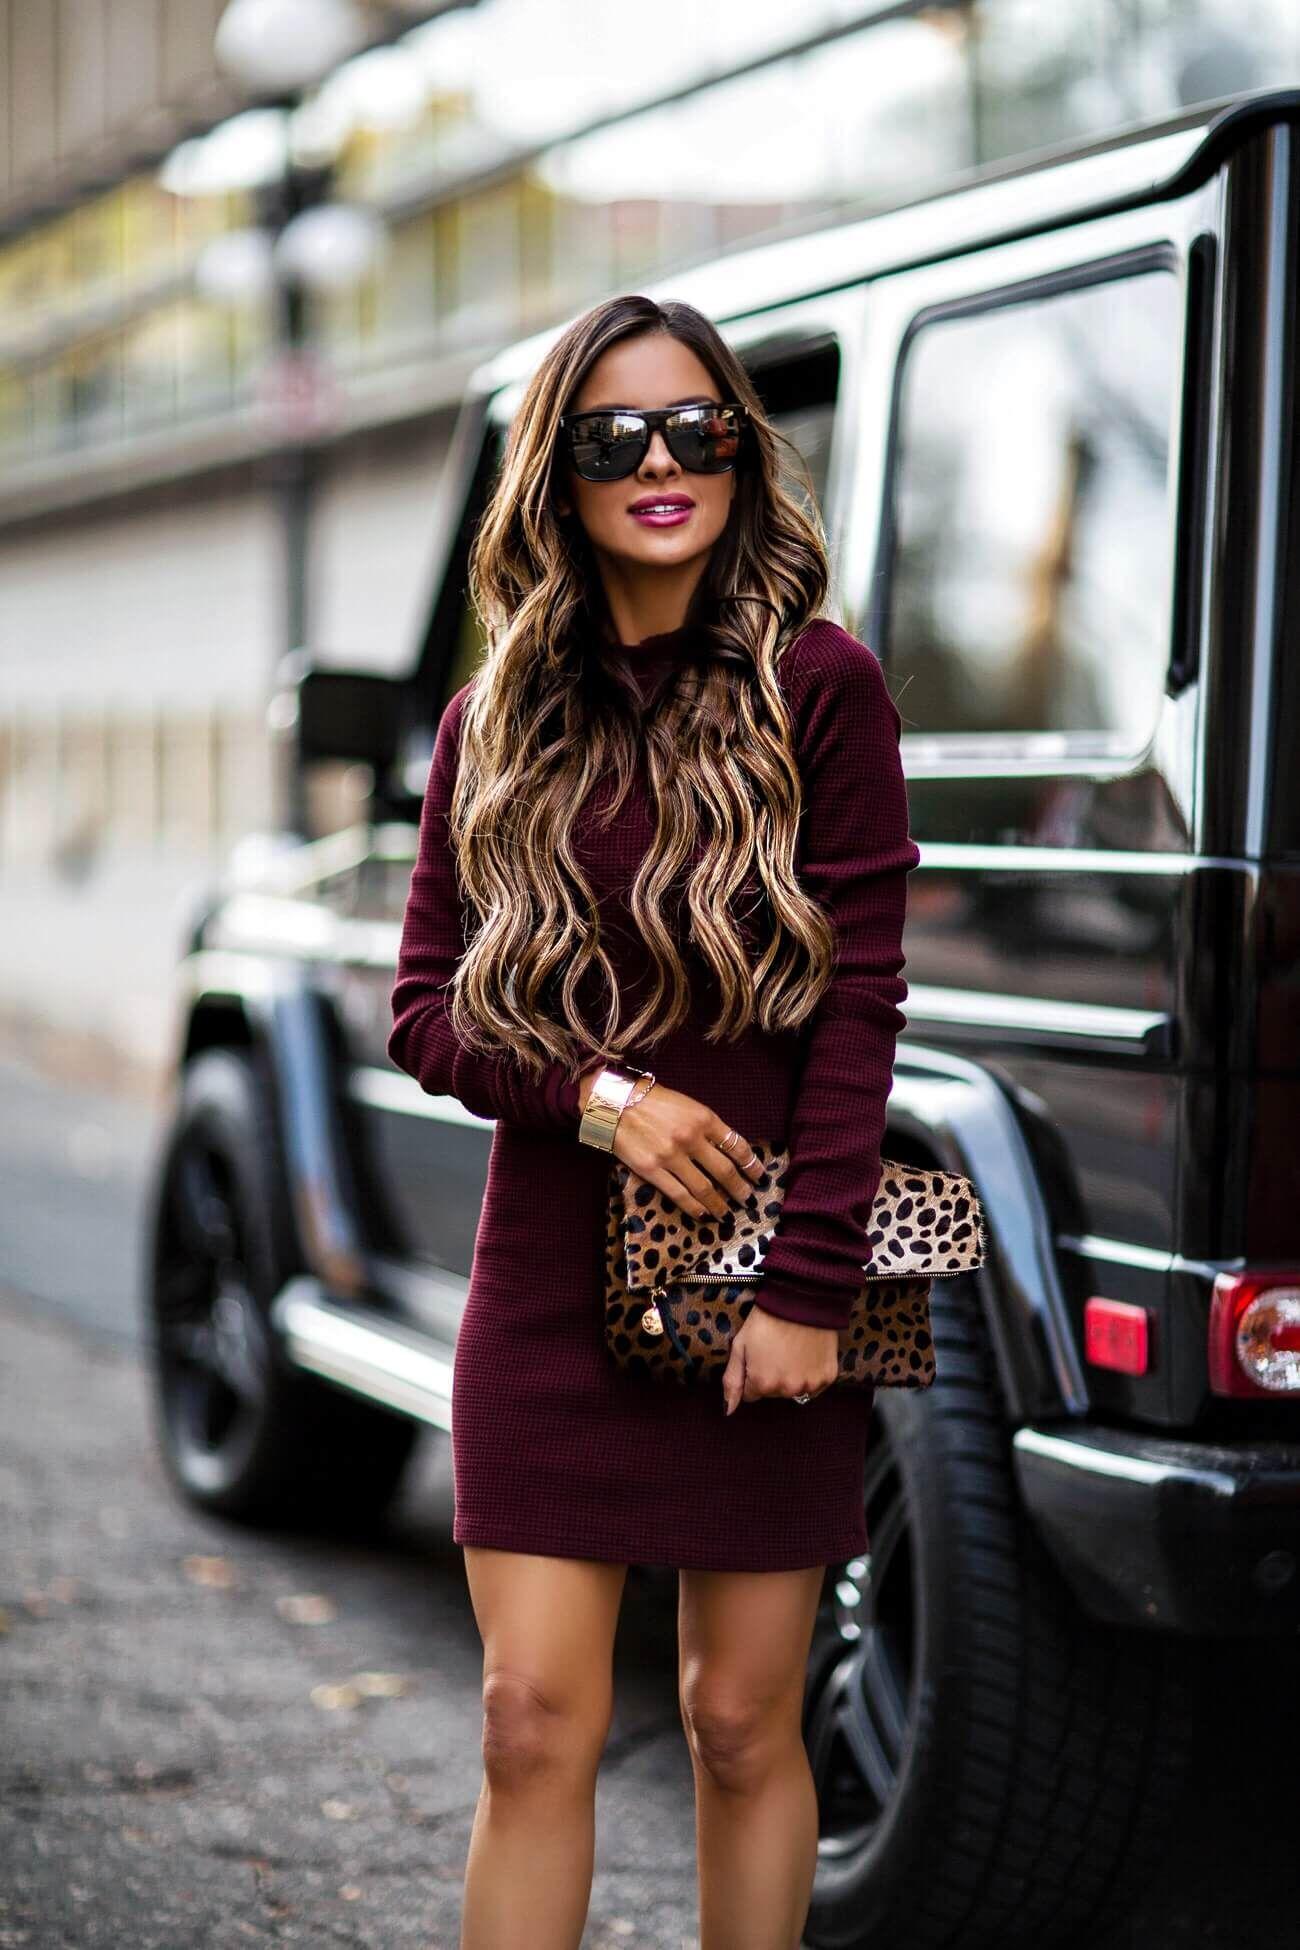 ac474736e80 fashion blogger mia mia mine wearing a burgundy dress from intermix and saint  laurent sunglasses